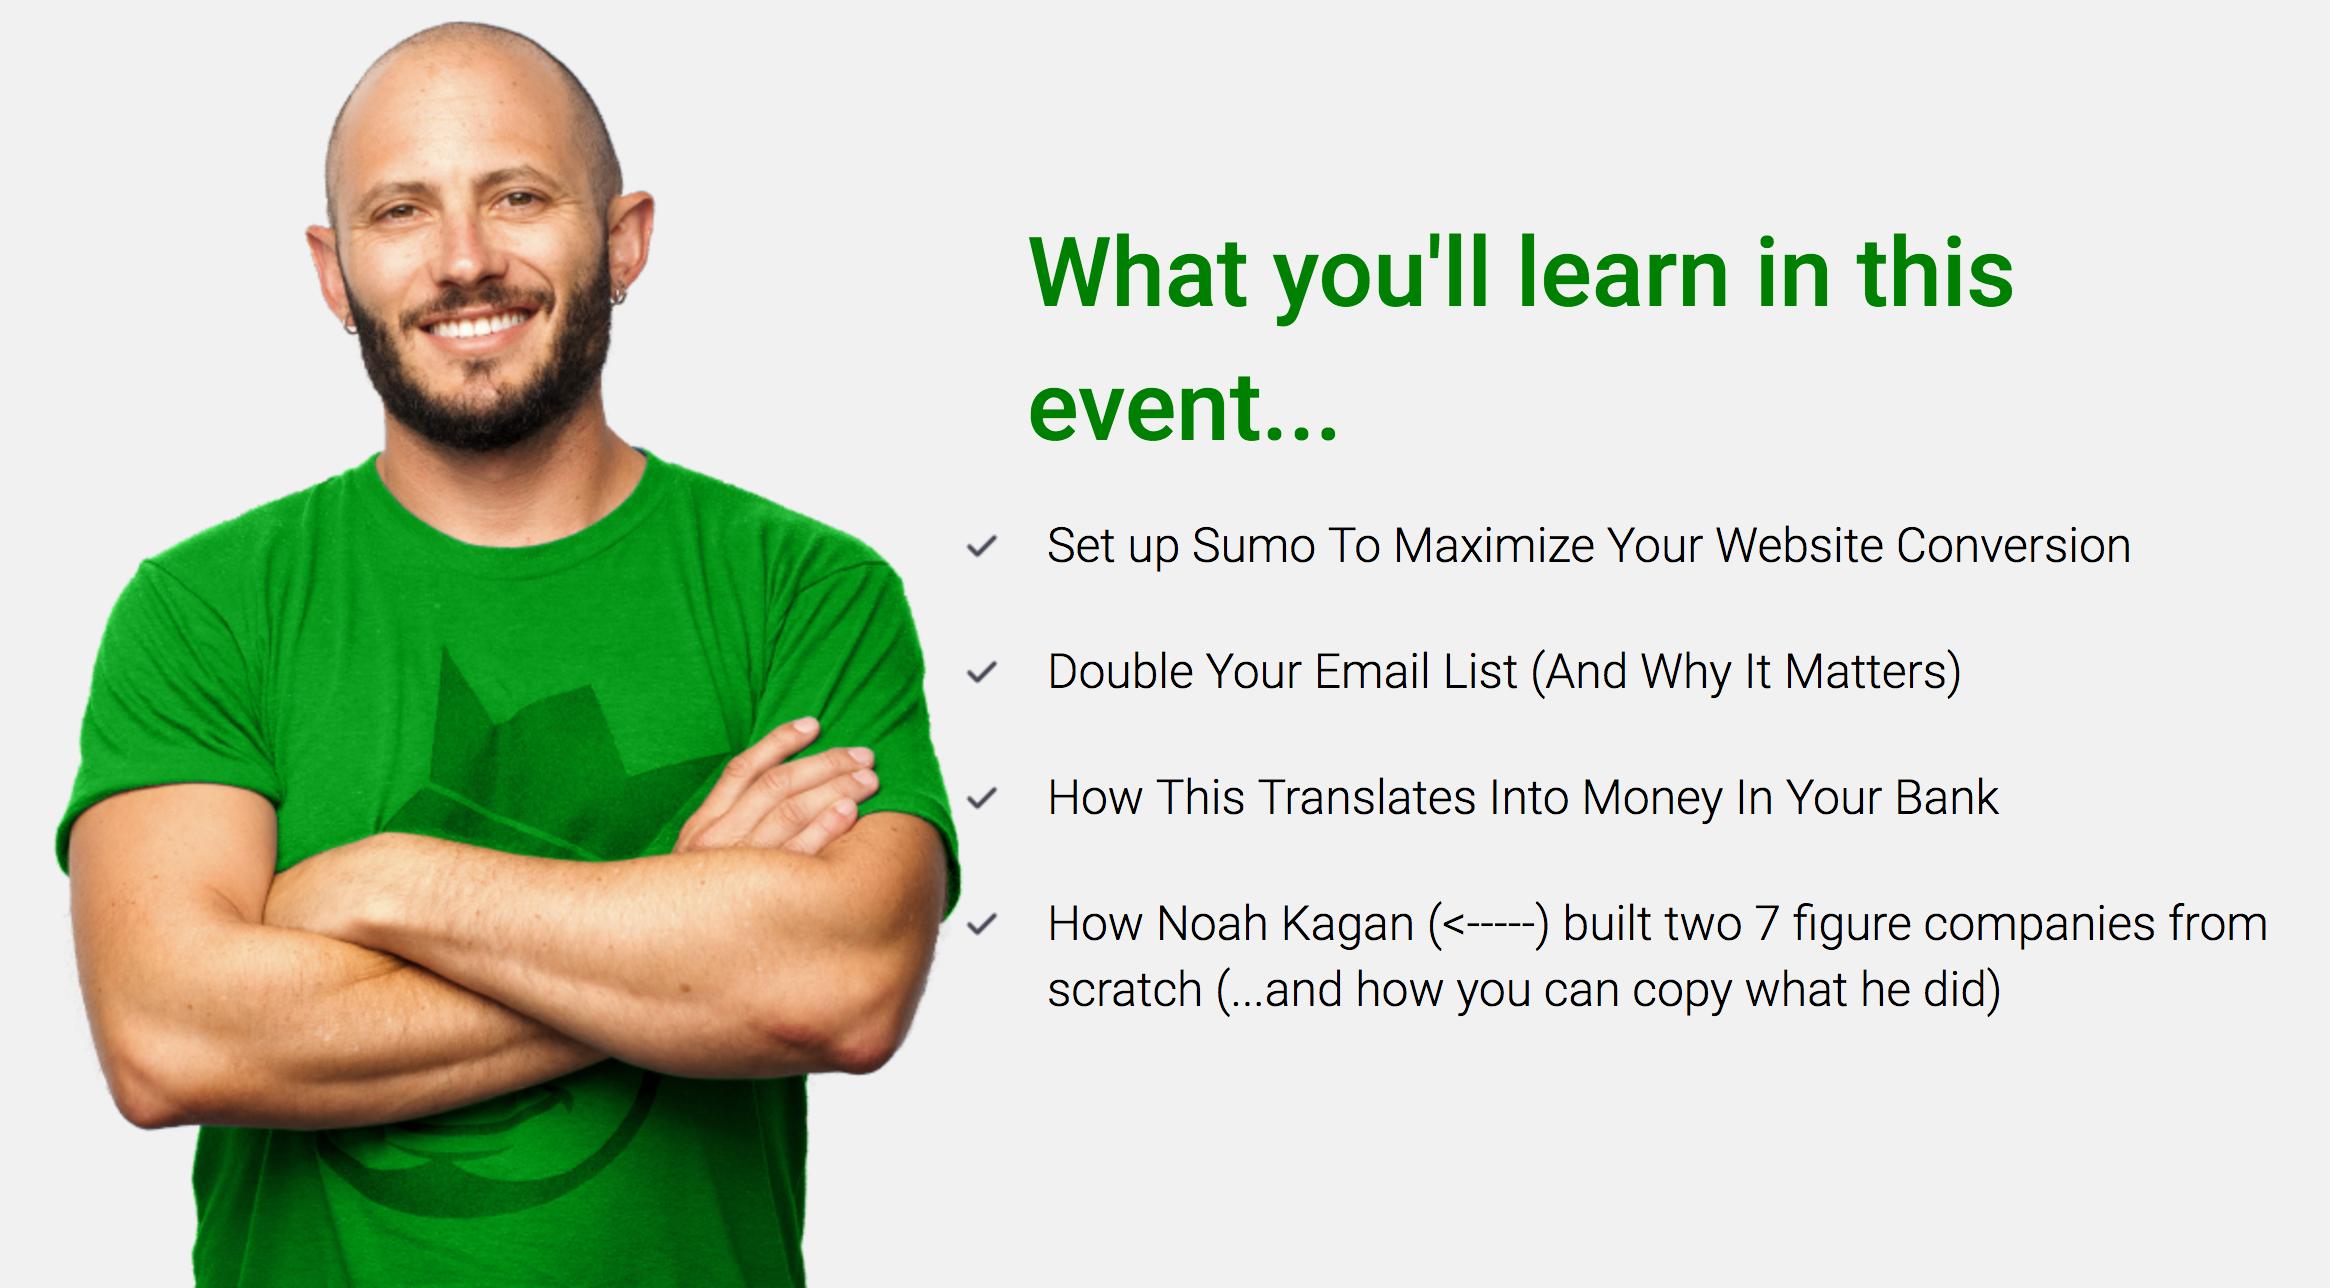 Screenshot of a webinar promotion image featuring Noah Kagan